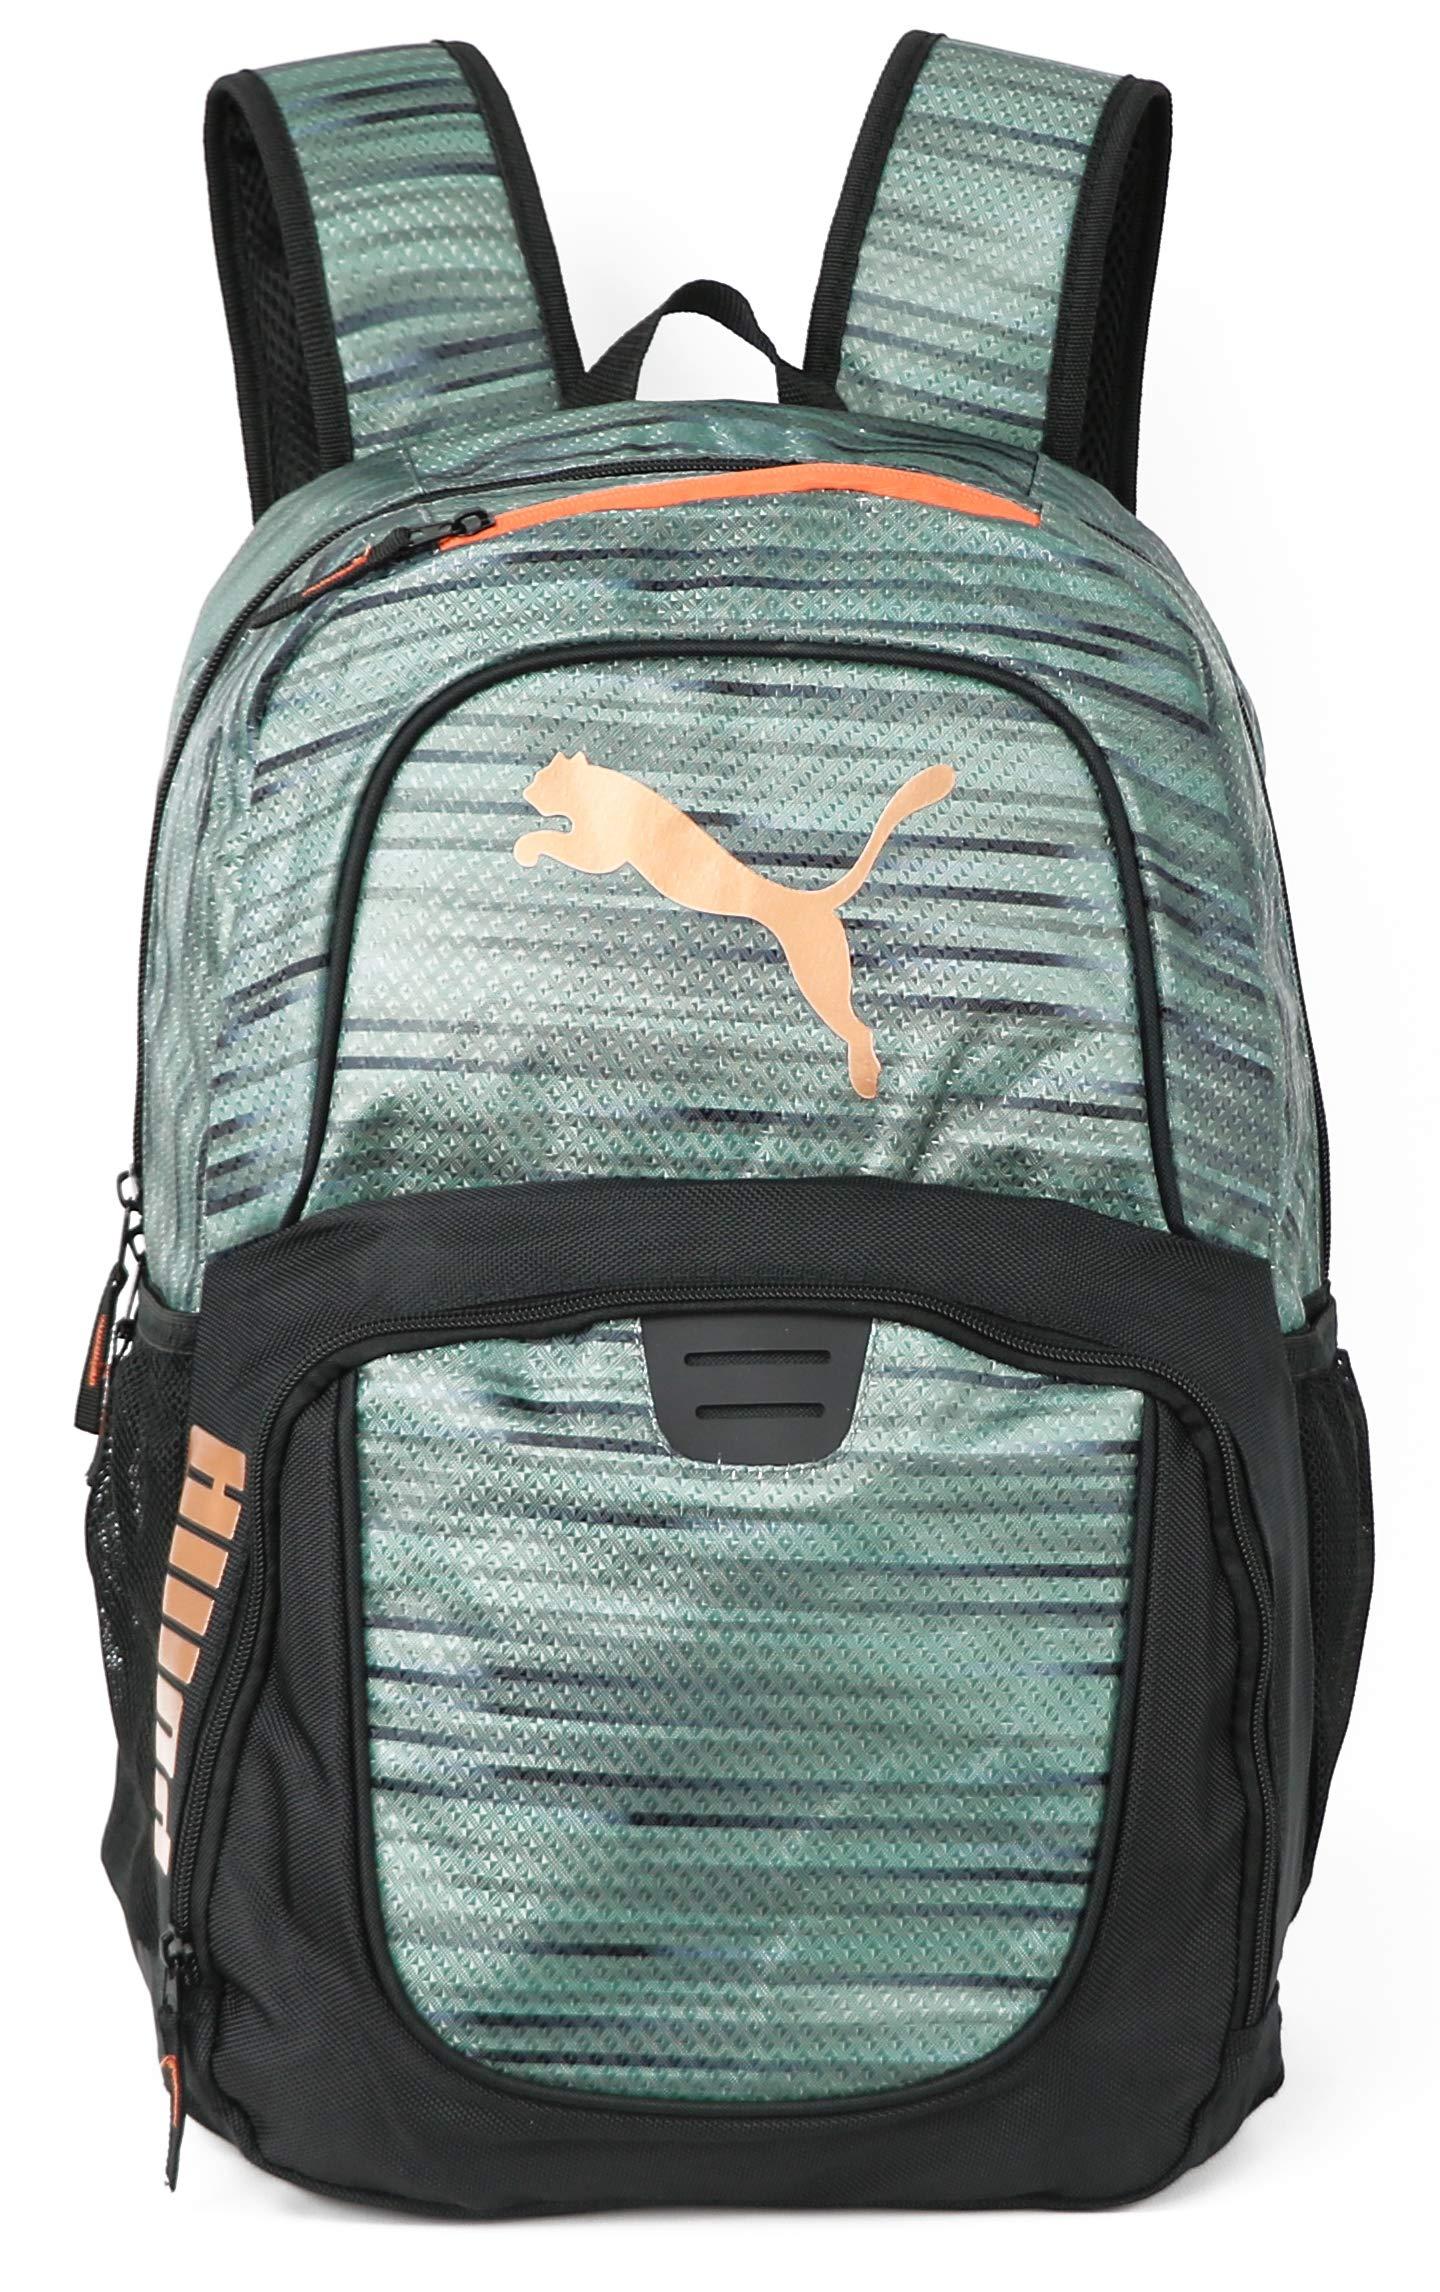 PUMA Men's Evercat Contender 3.0 Backpack (One Size, Dark Green)